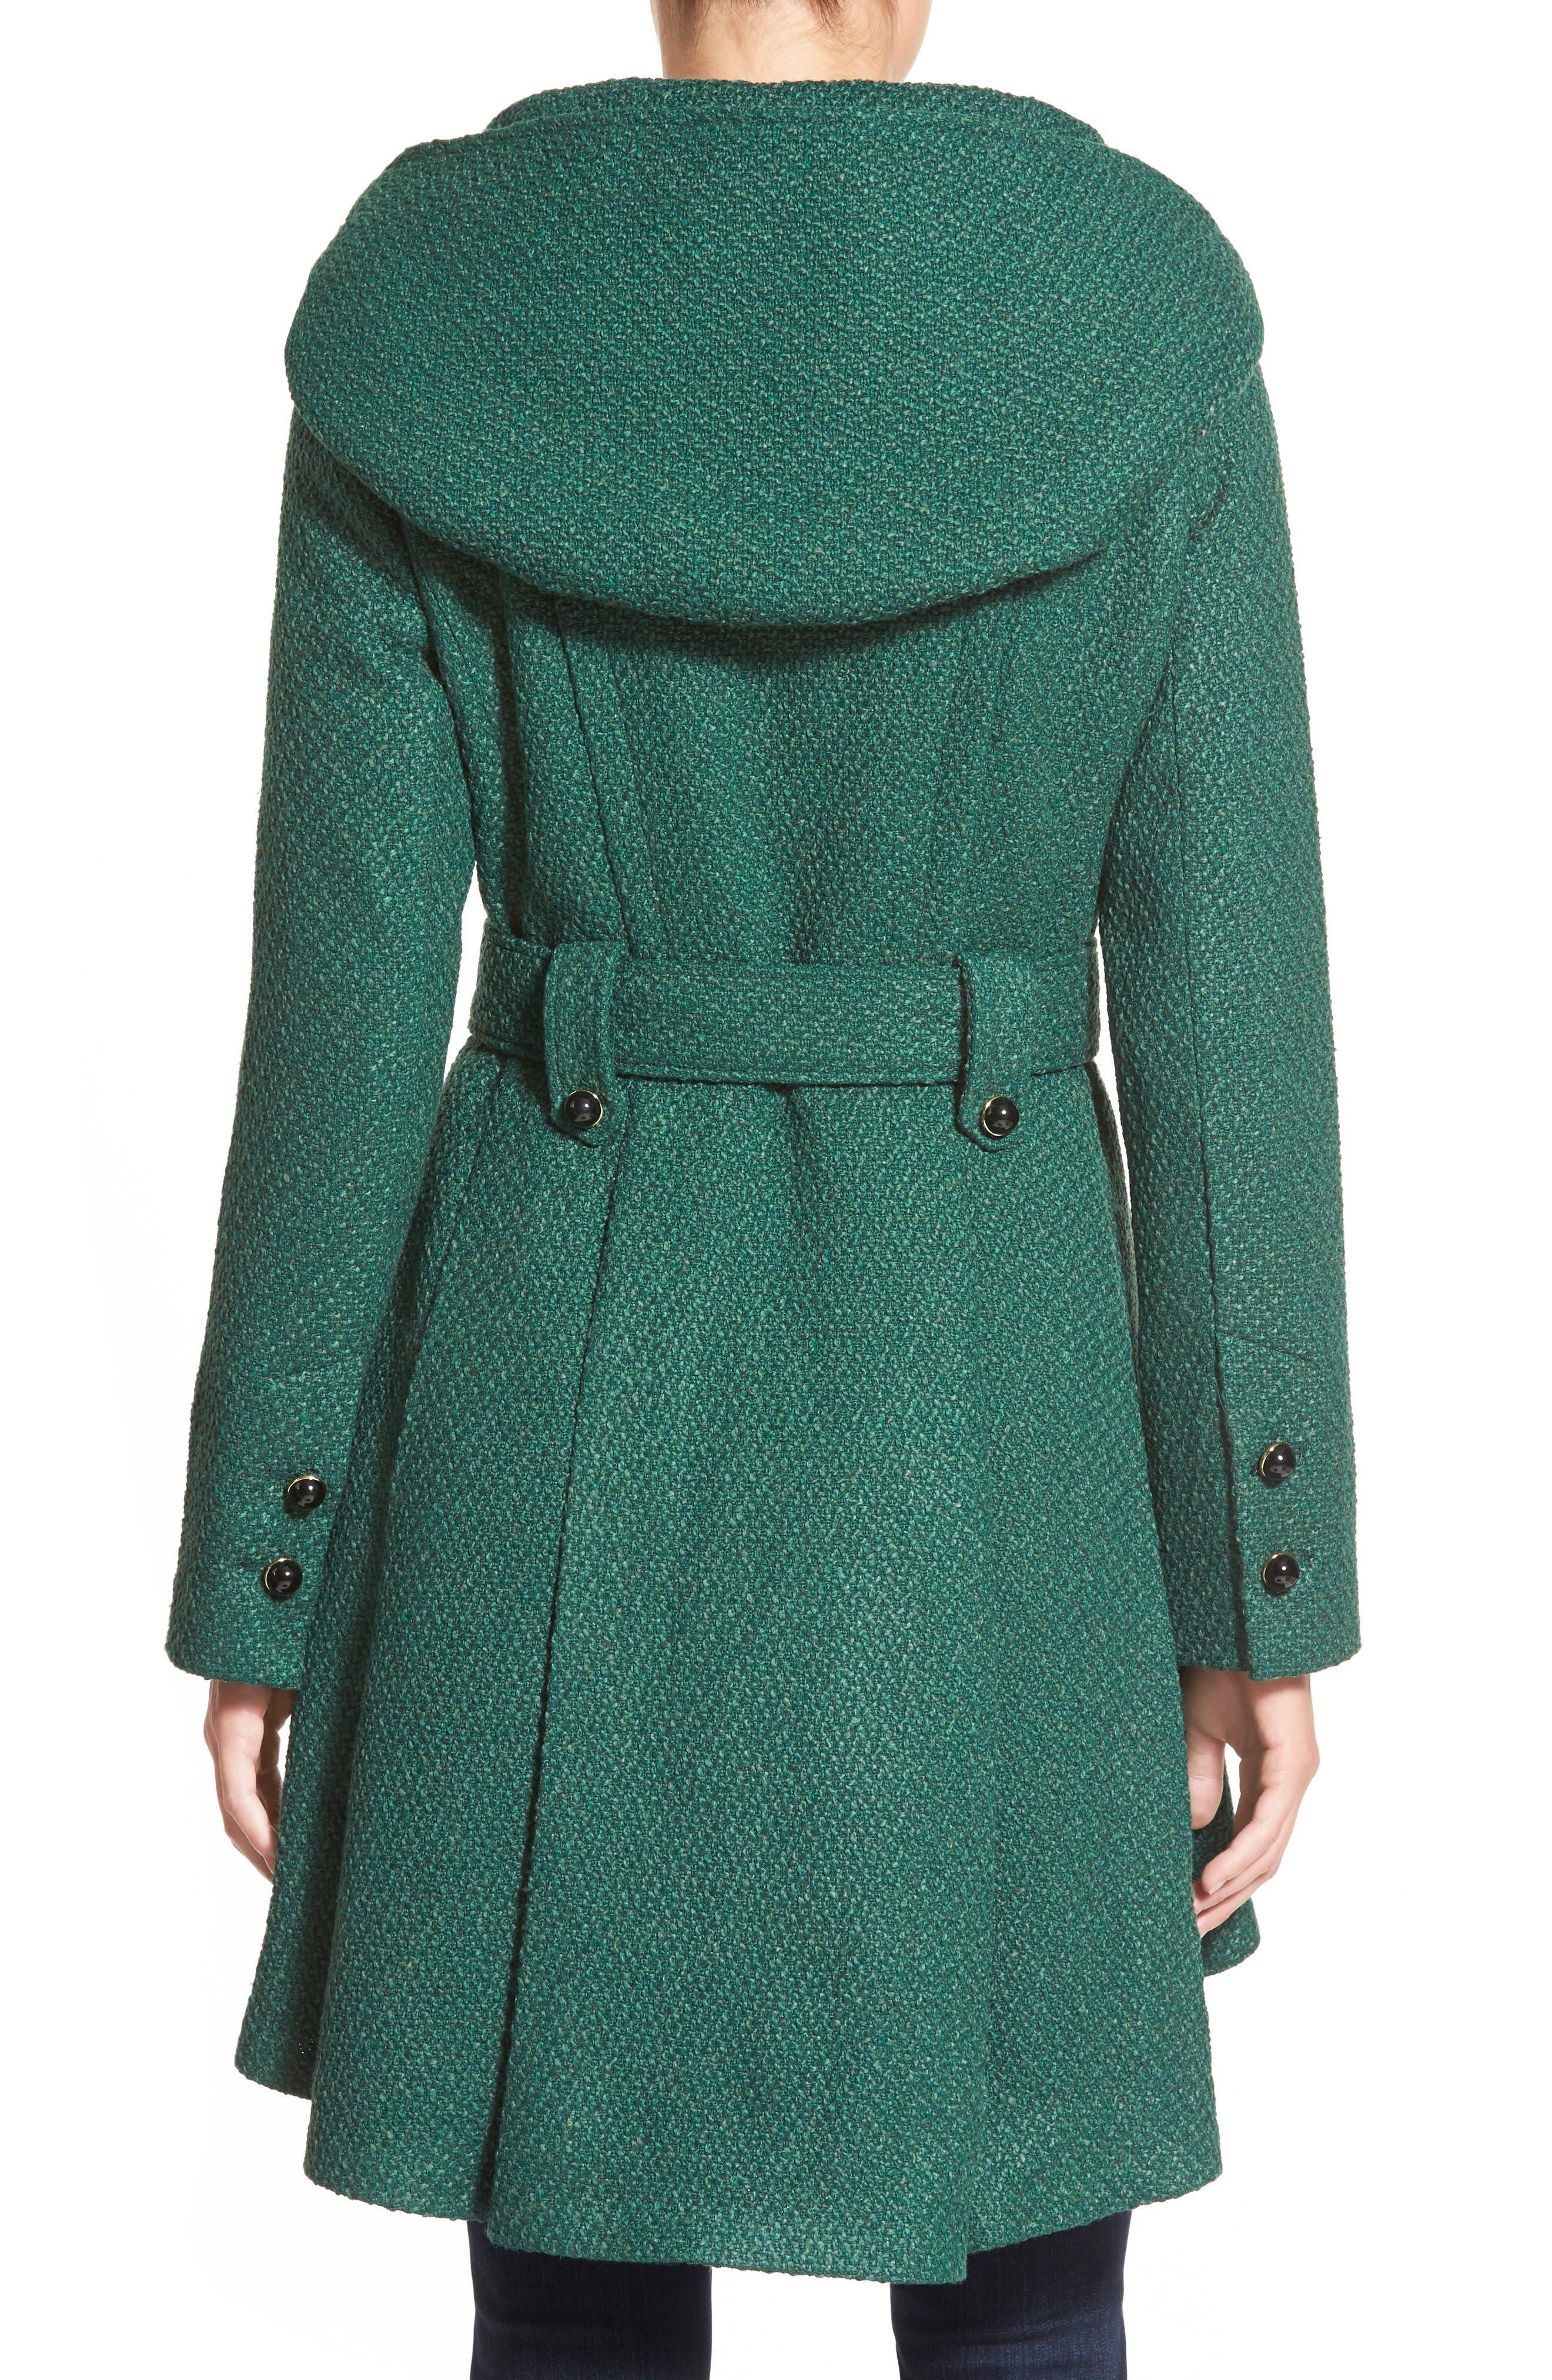 Belted Hooded Skirted Coat,                             Alternate thumbnail 13, color,